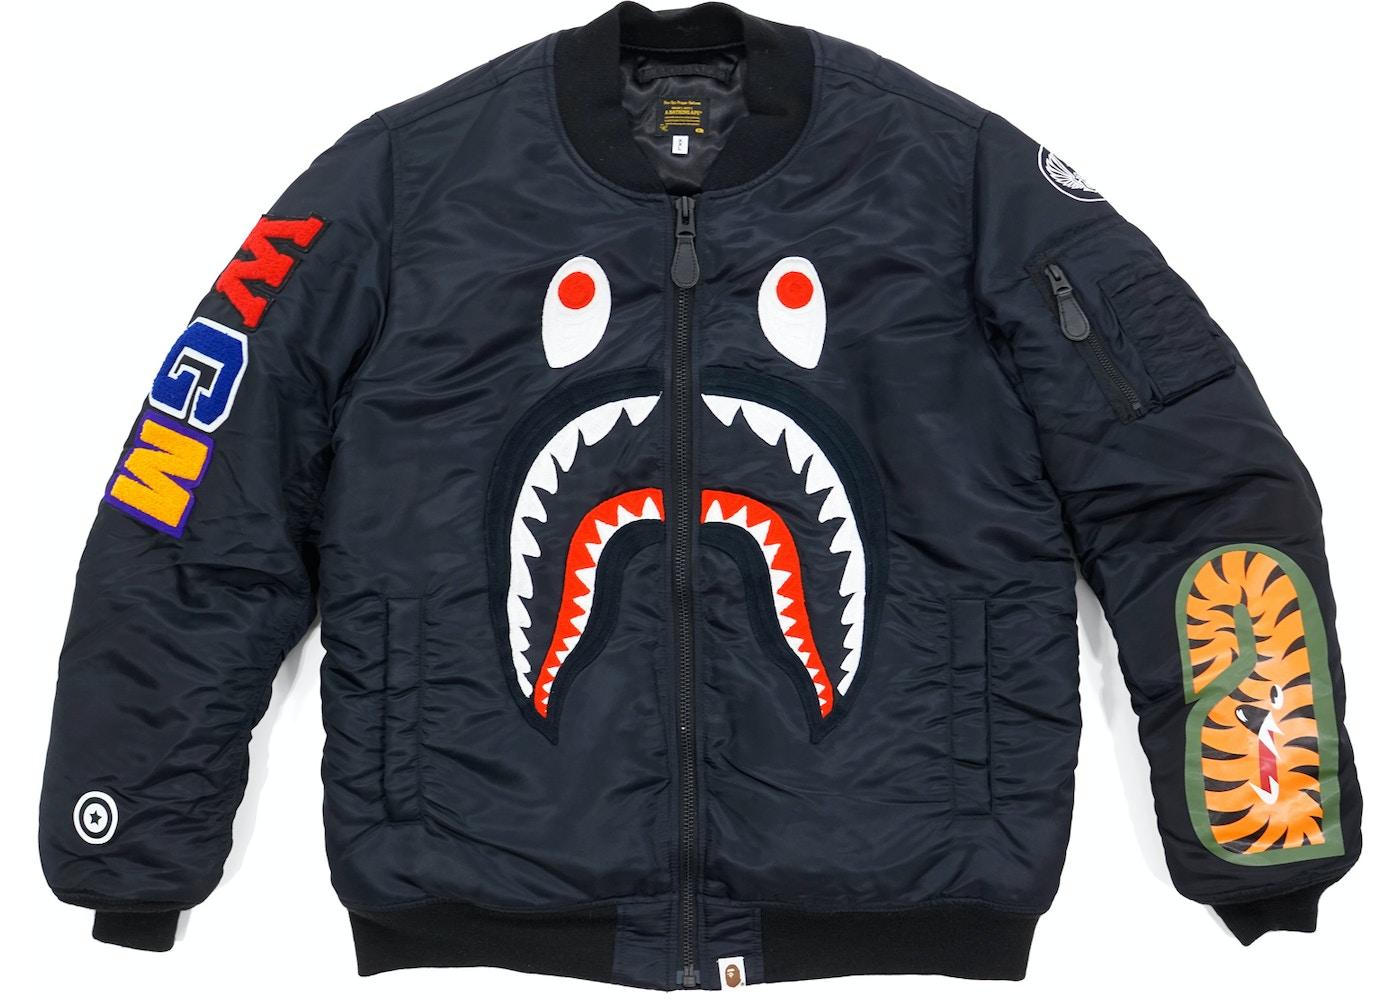 672eb0a76746 Streetwear - Bape Jackets - Highest Bid